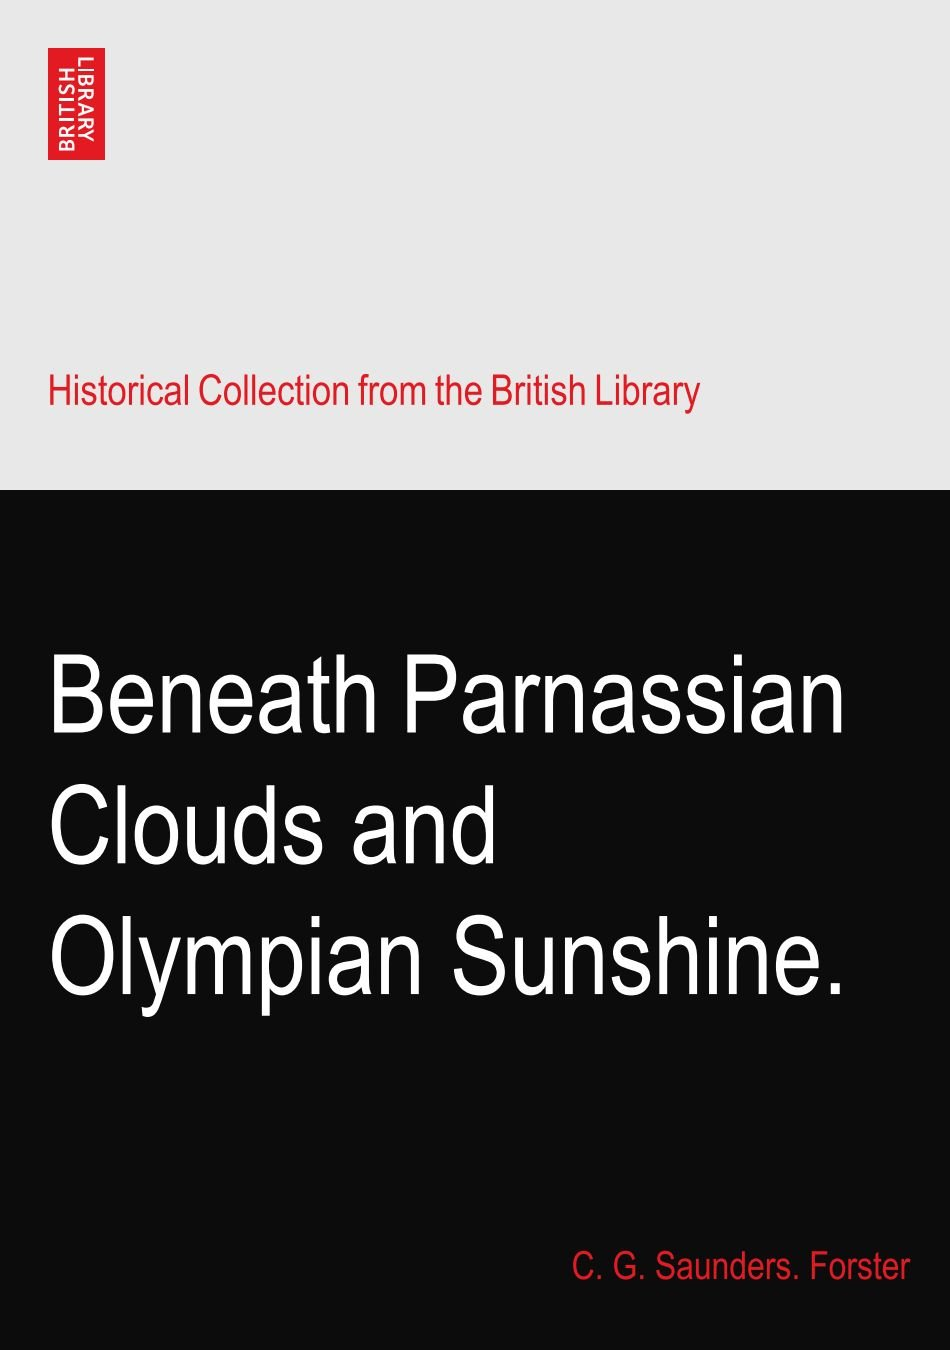 Beneath Parnassian Clouds and Olympian Sunshine. PDF